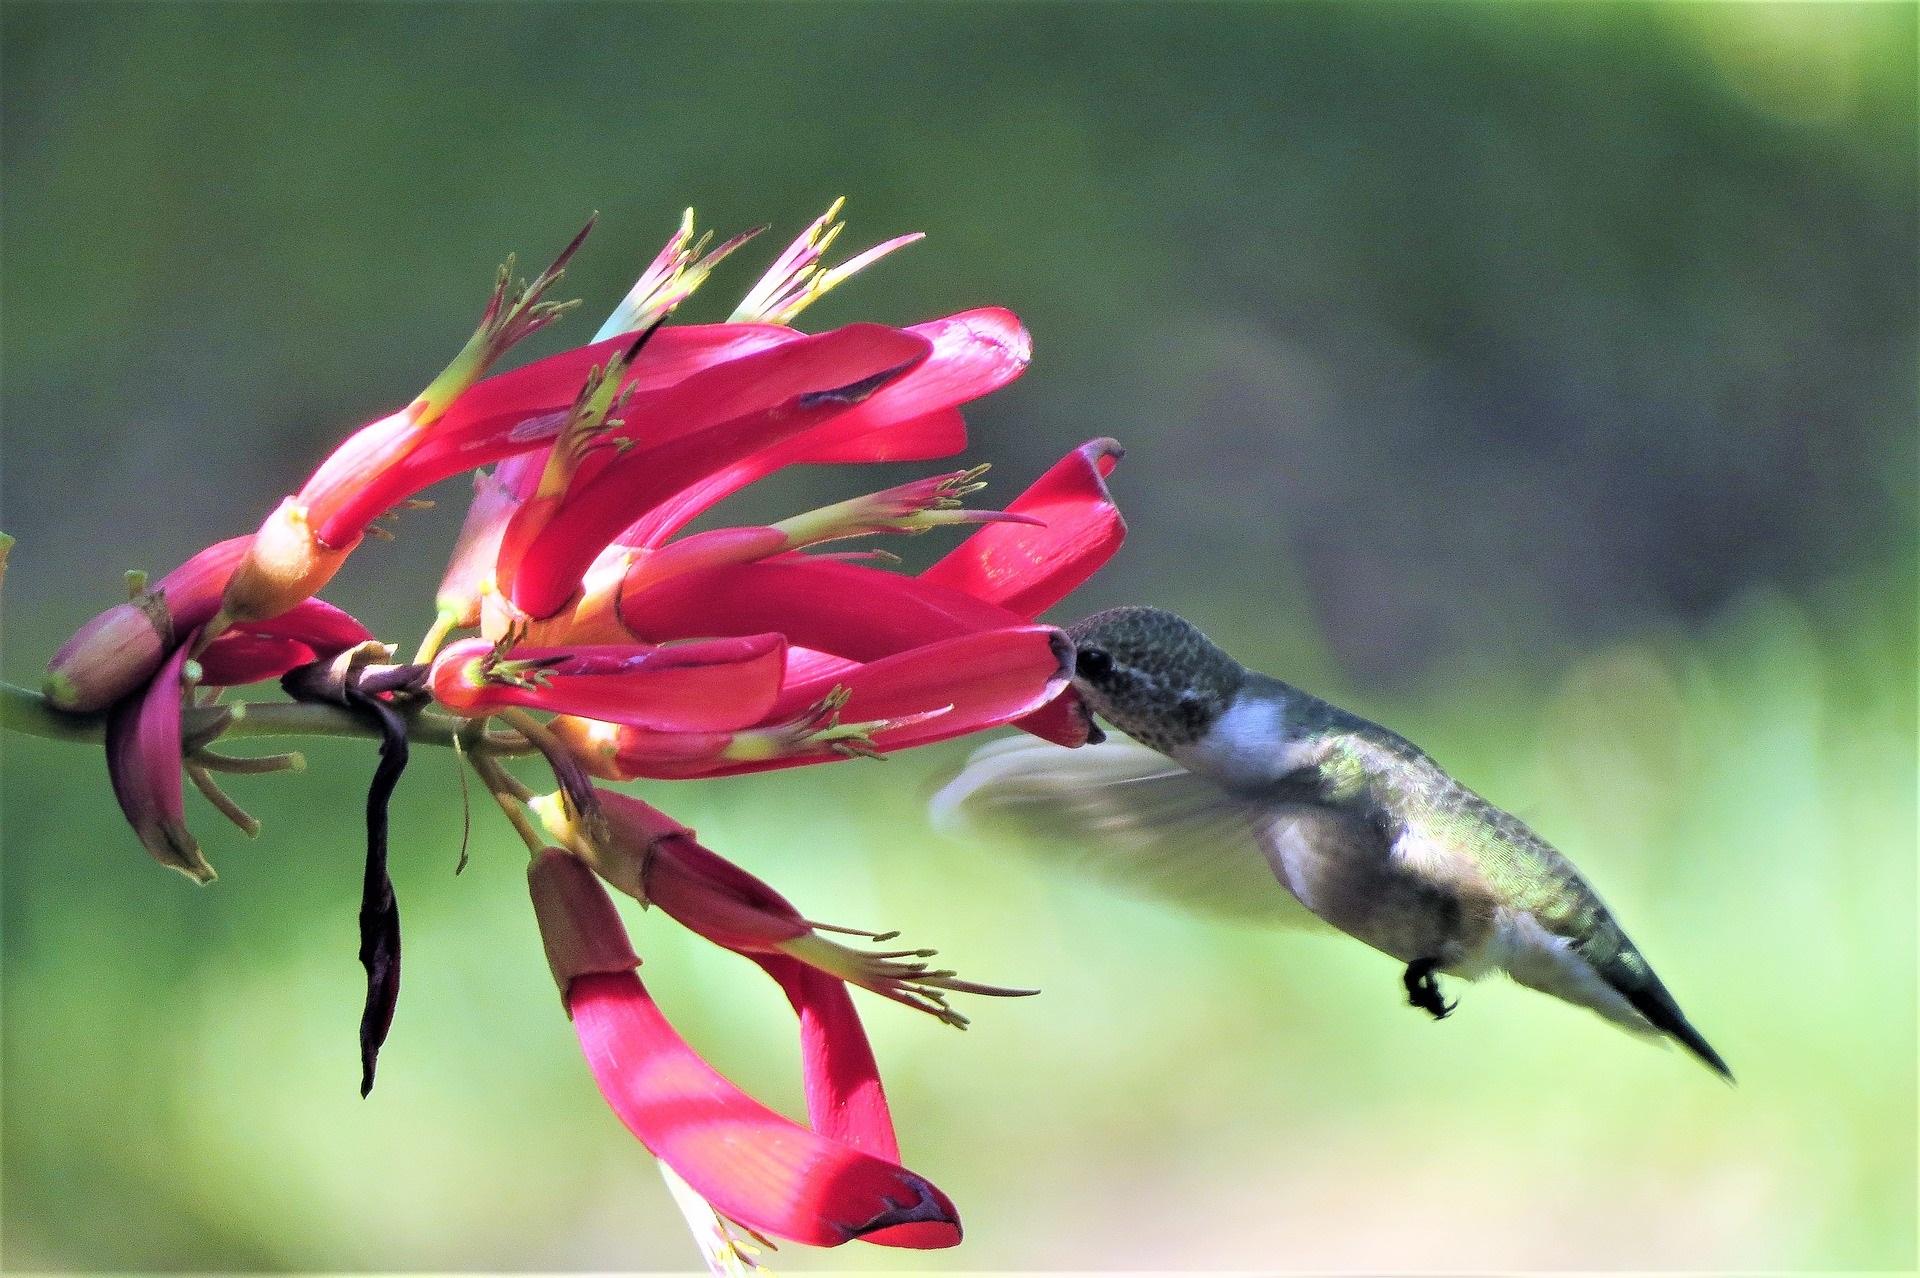 Hummingbird - Produced by GeorgeB2 from Pixabay.jpg